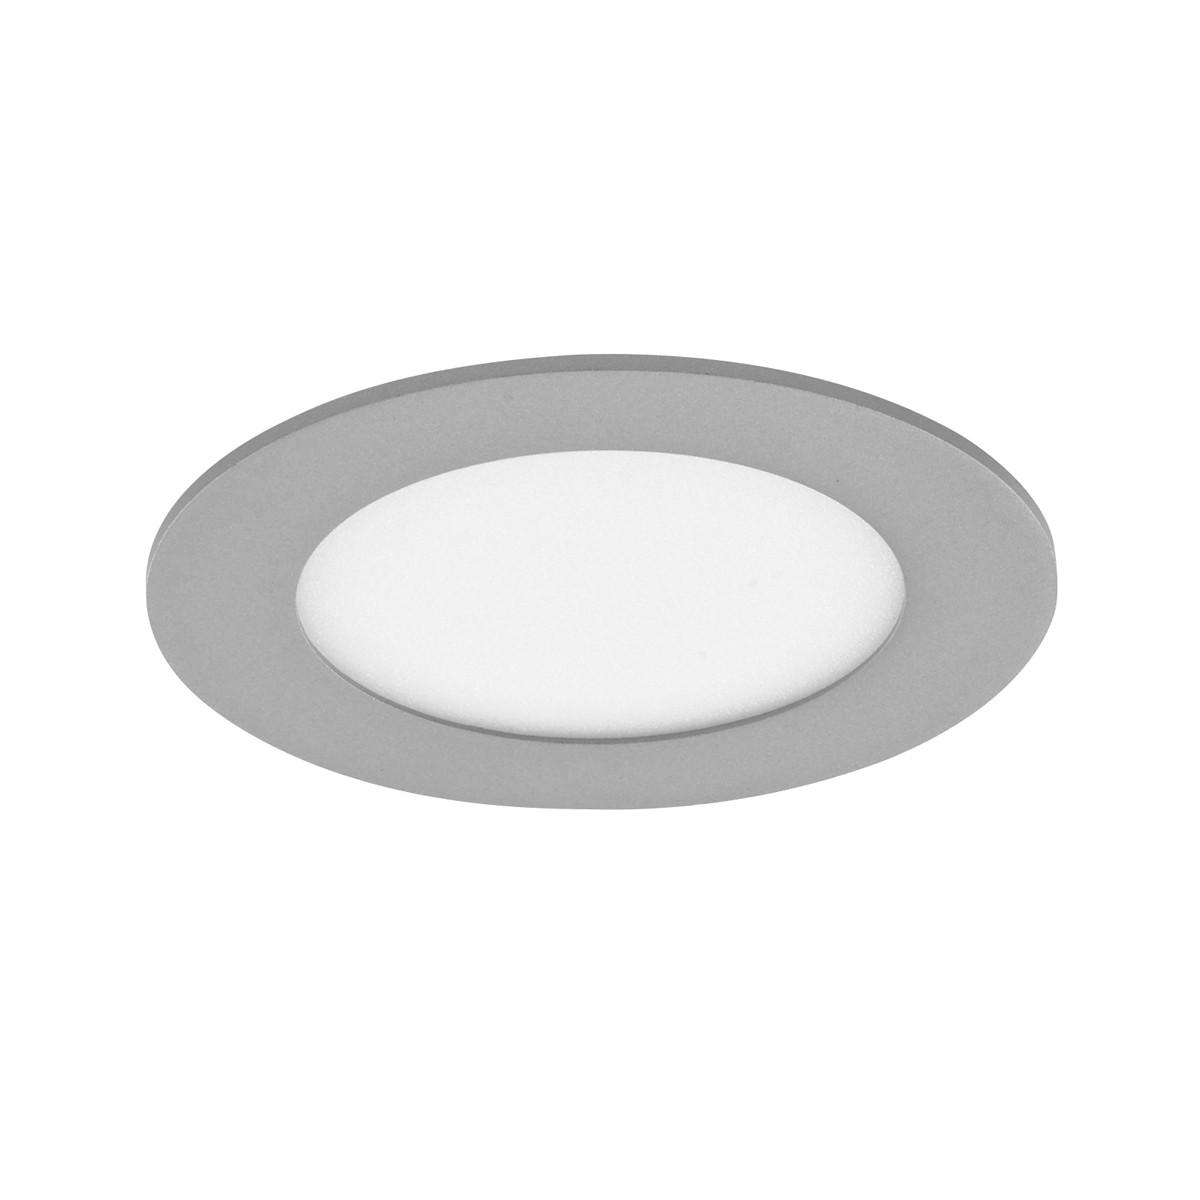 Novo Plus LED Downlight RD 6W Grey